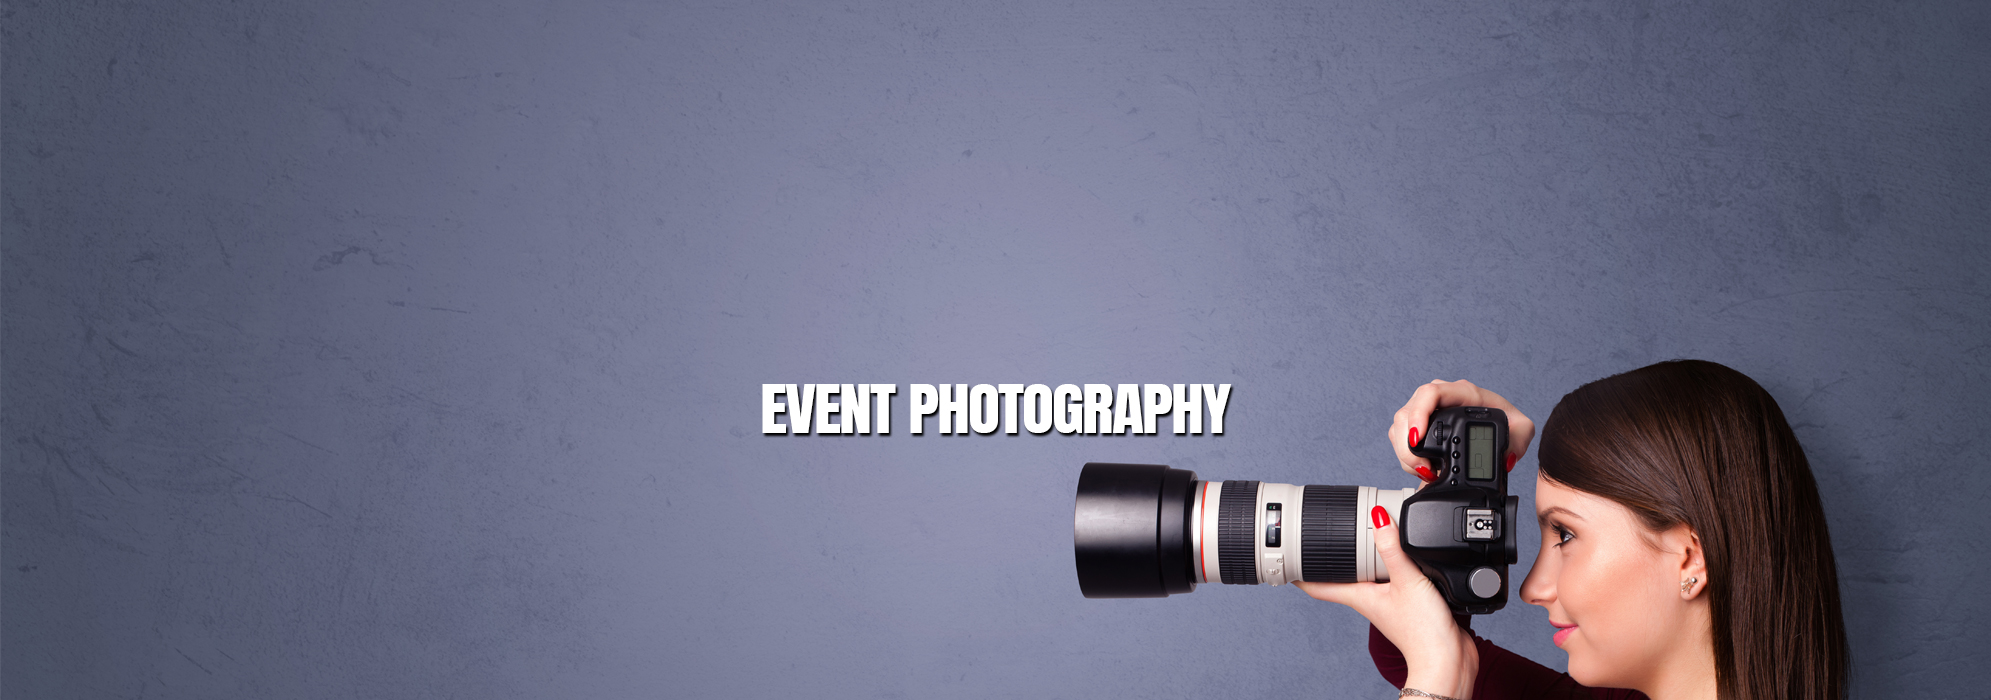 EventPhotographyNew